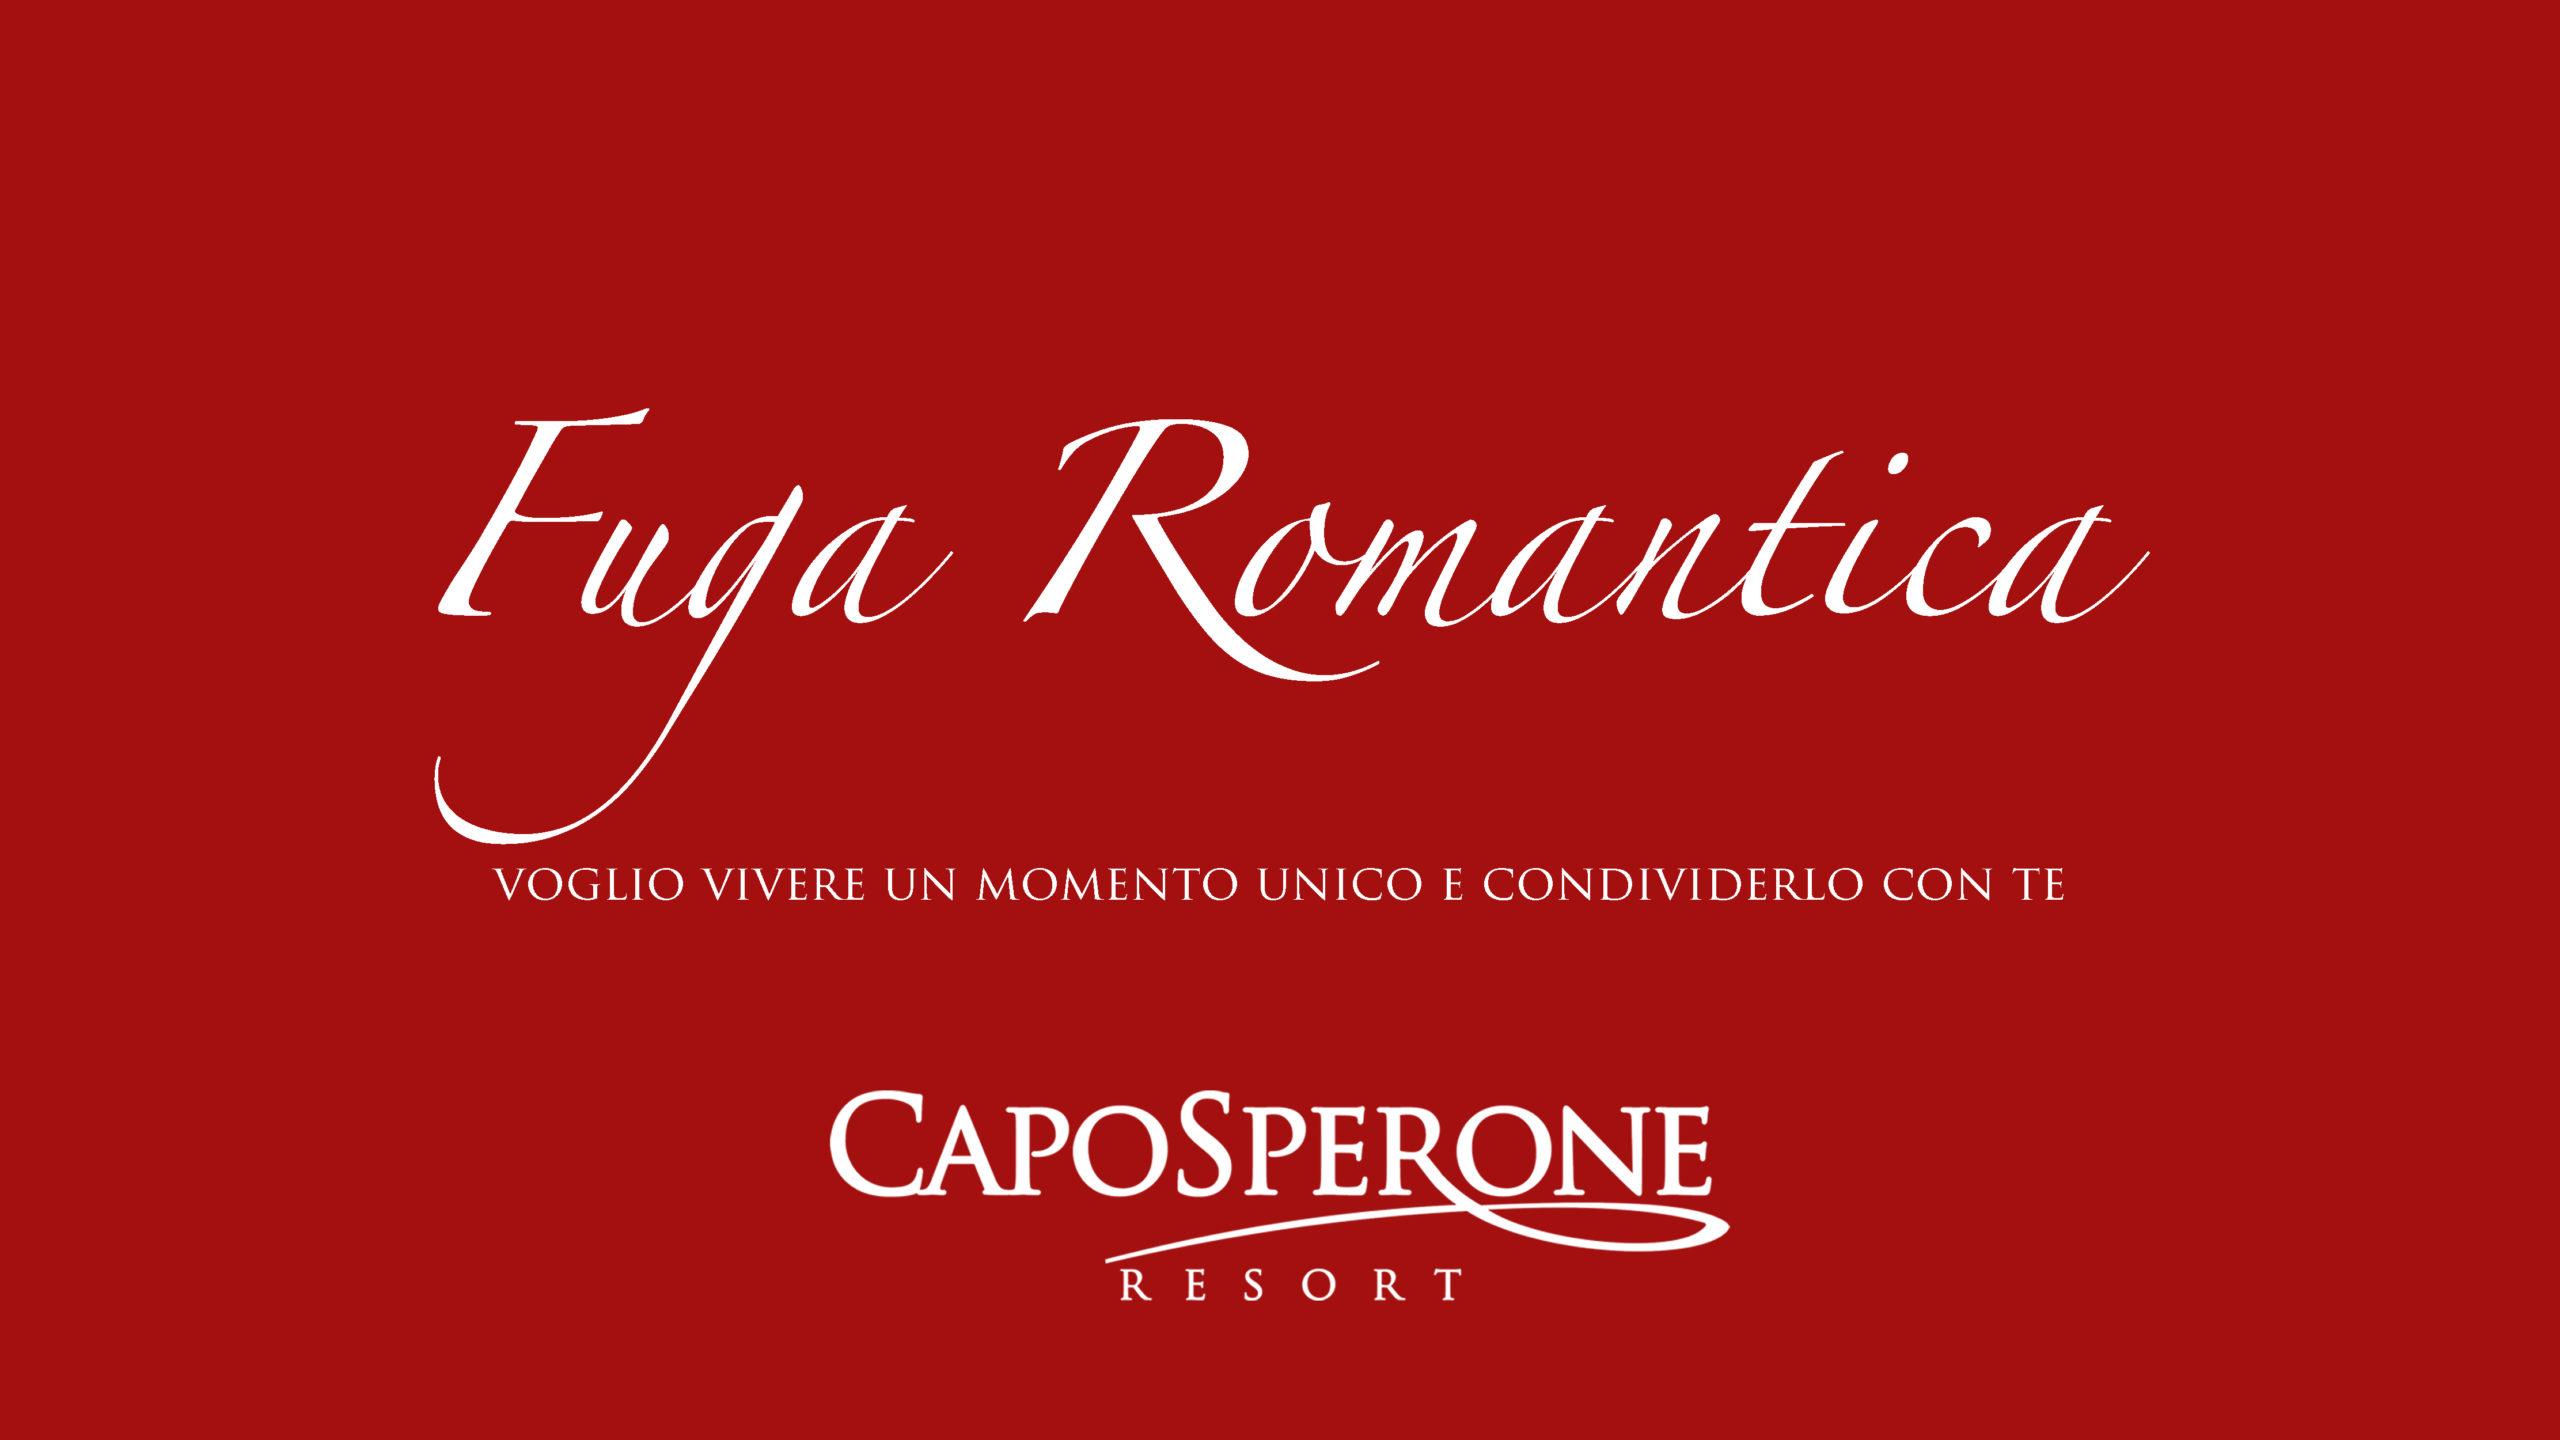 Fuga Romantica